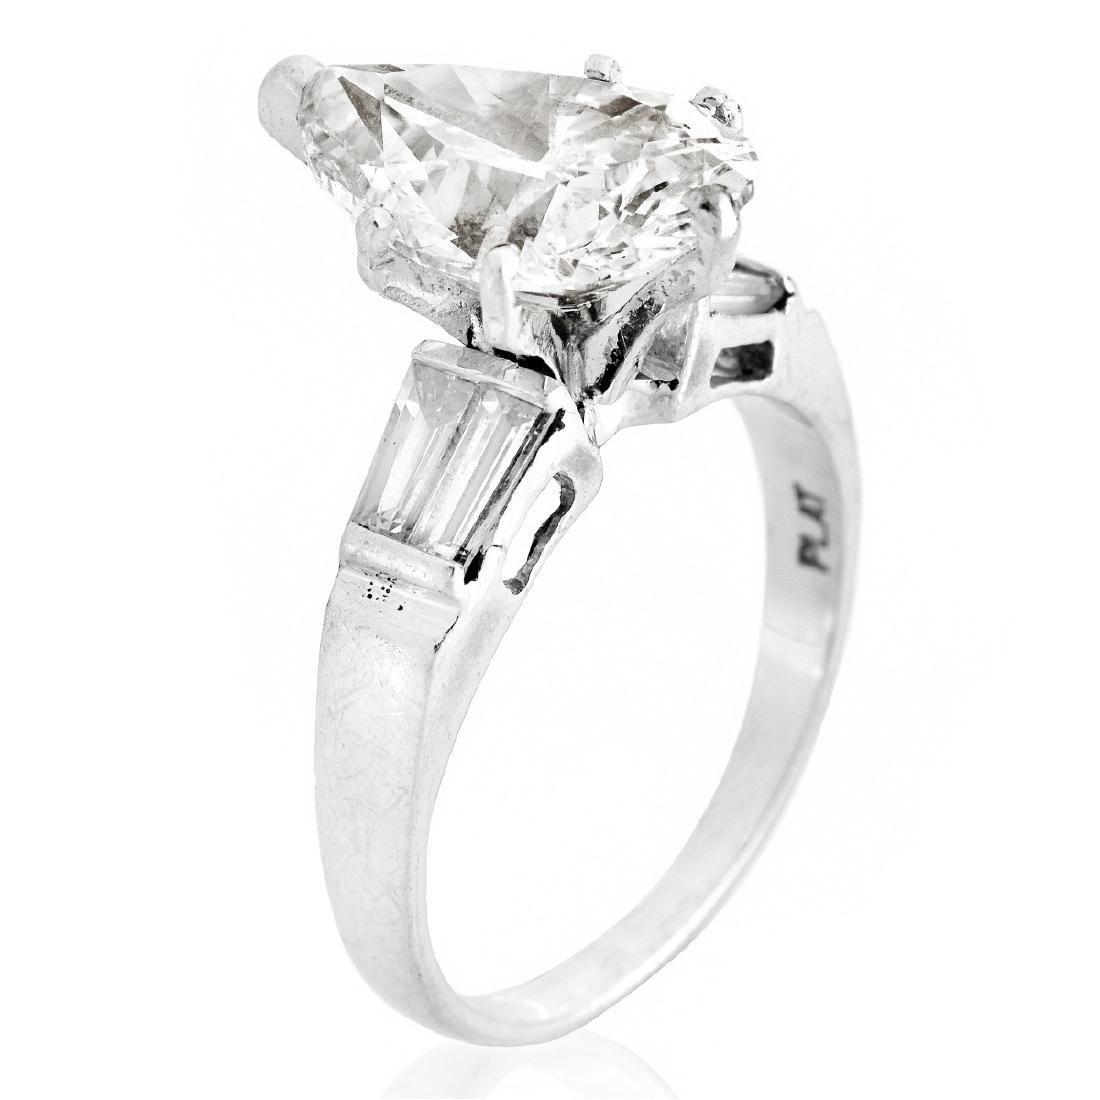 GIA Certified 3.06ct Diamond Ring